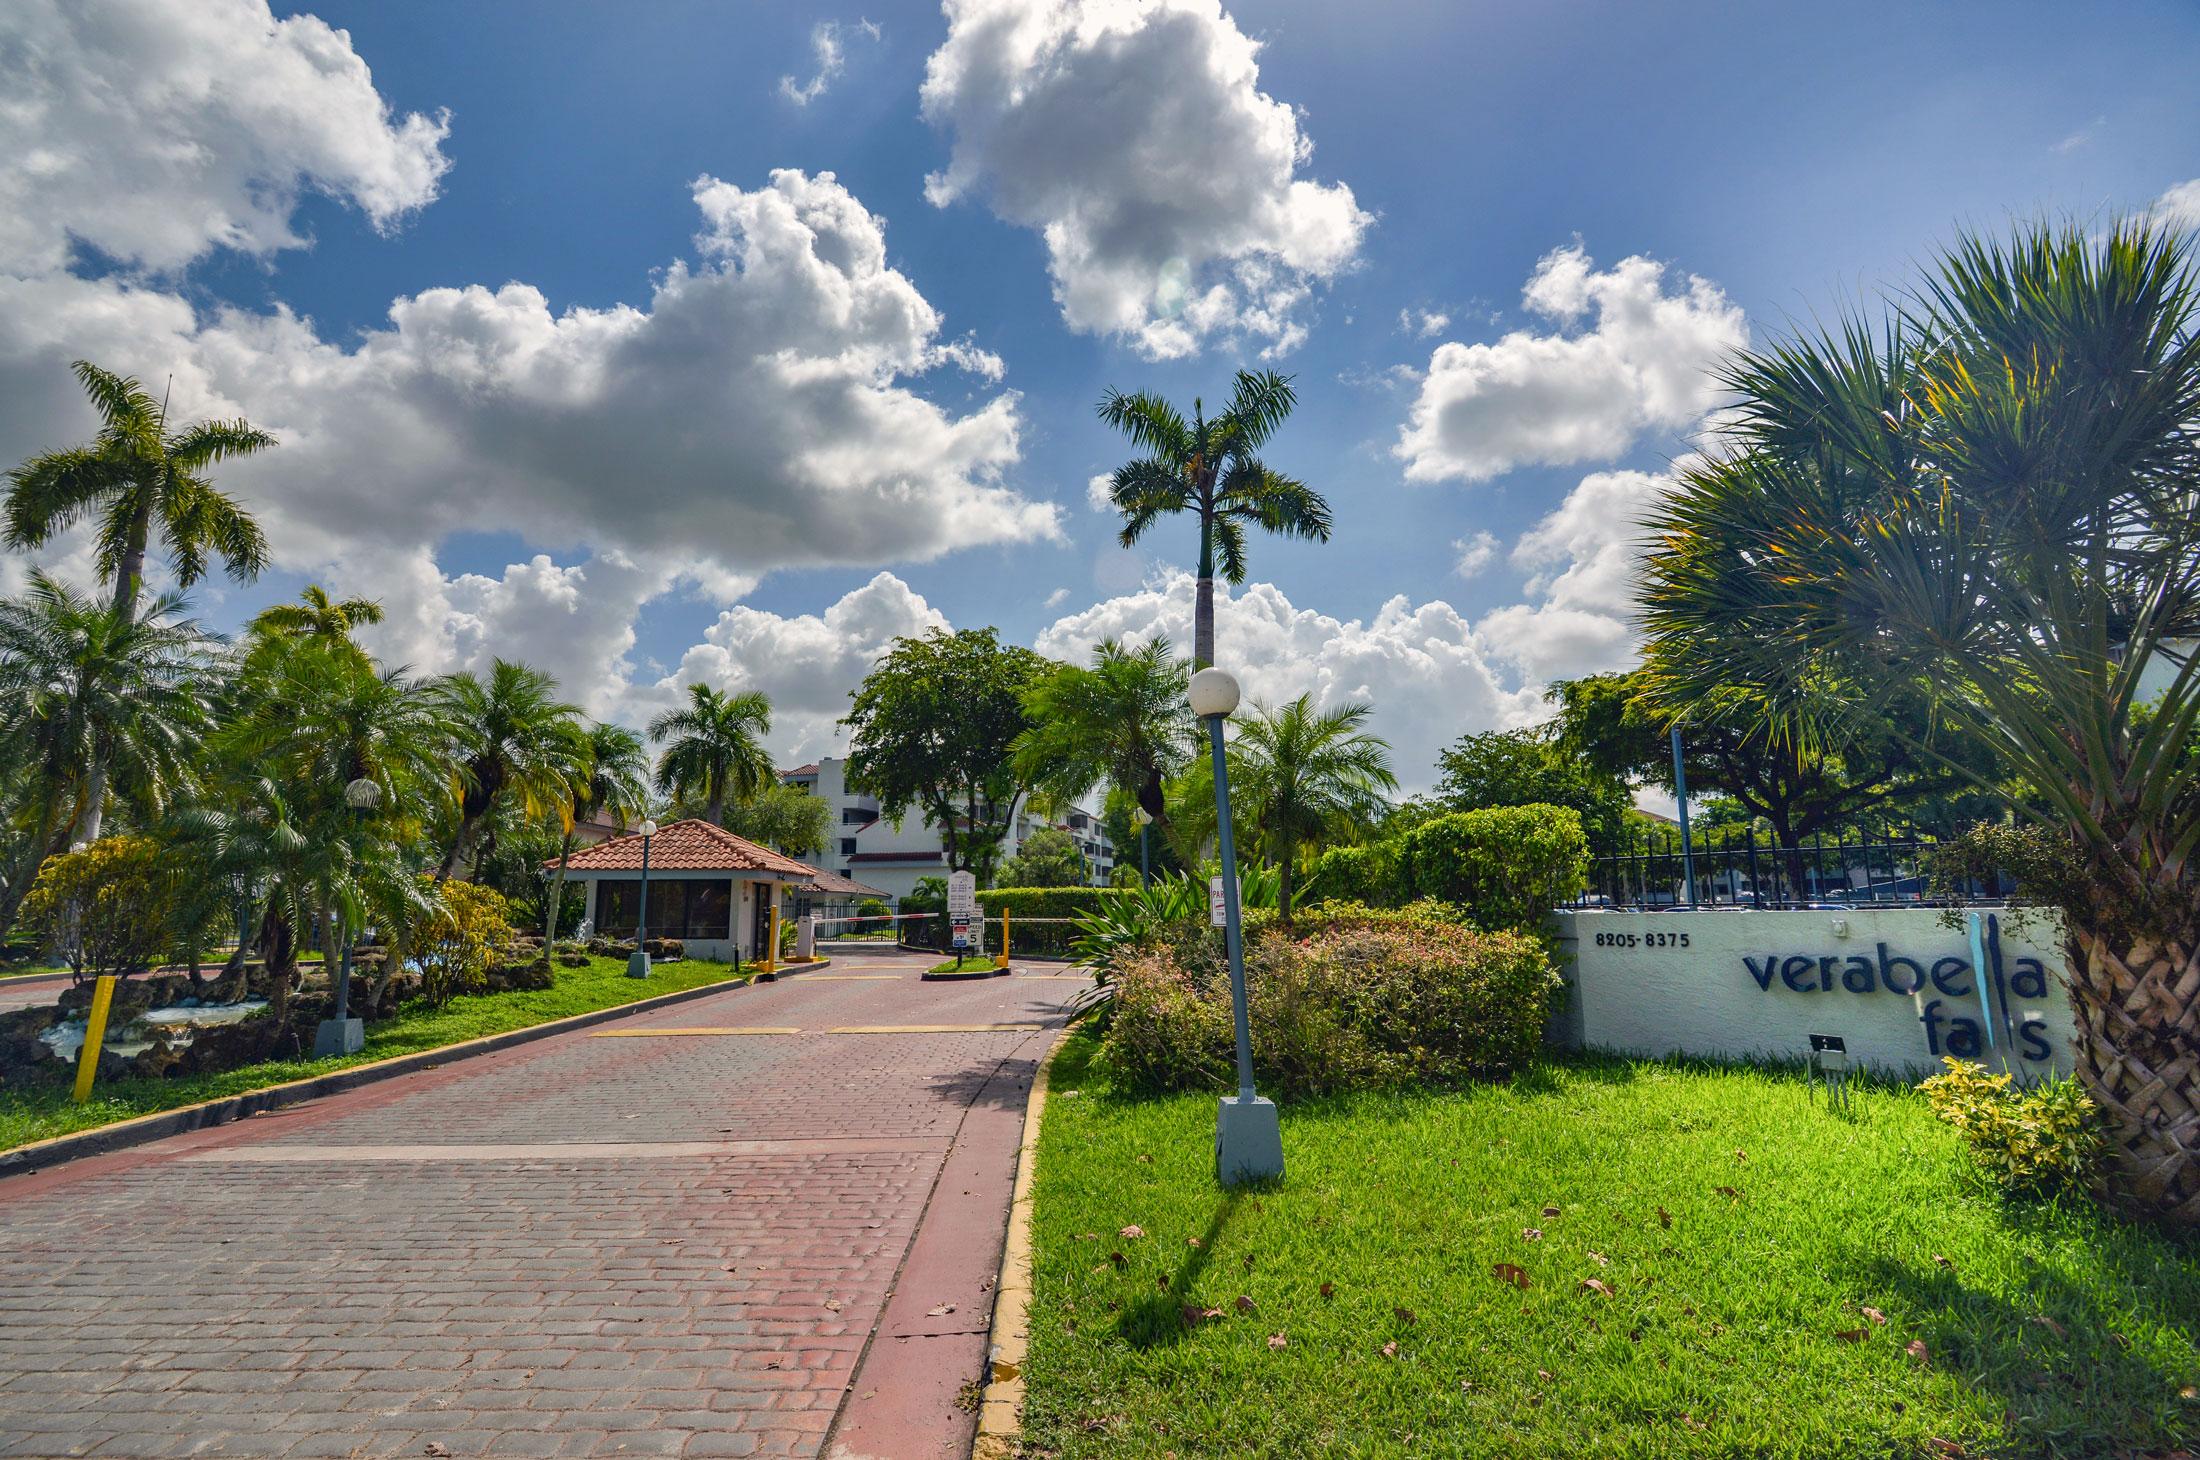 8305 SW 152nd Ave, A-109, Miami FL 33193 main entrance